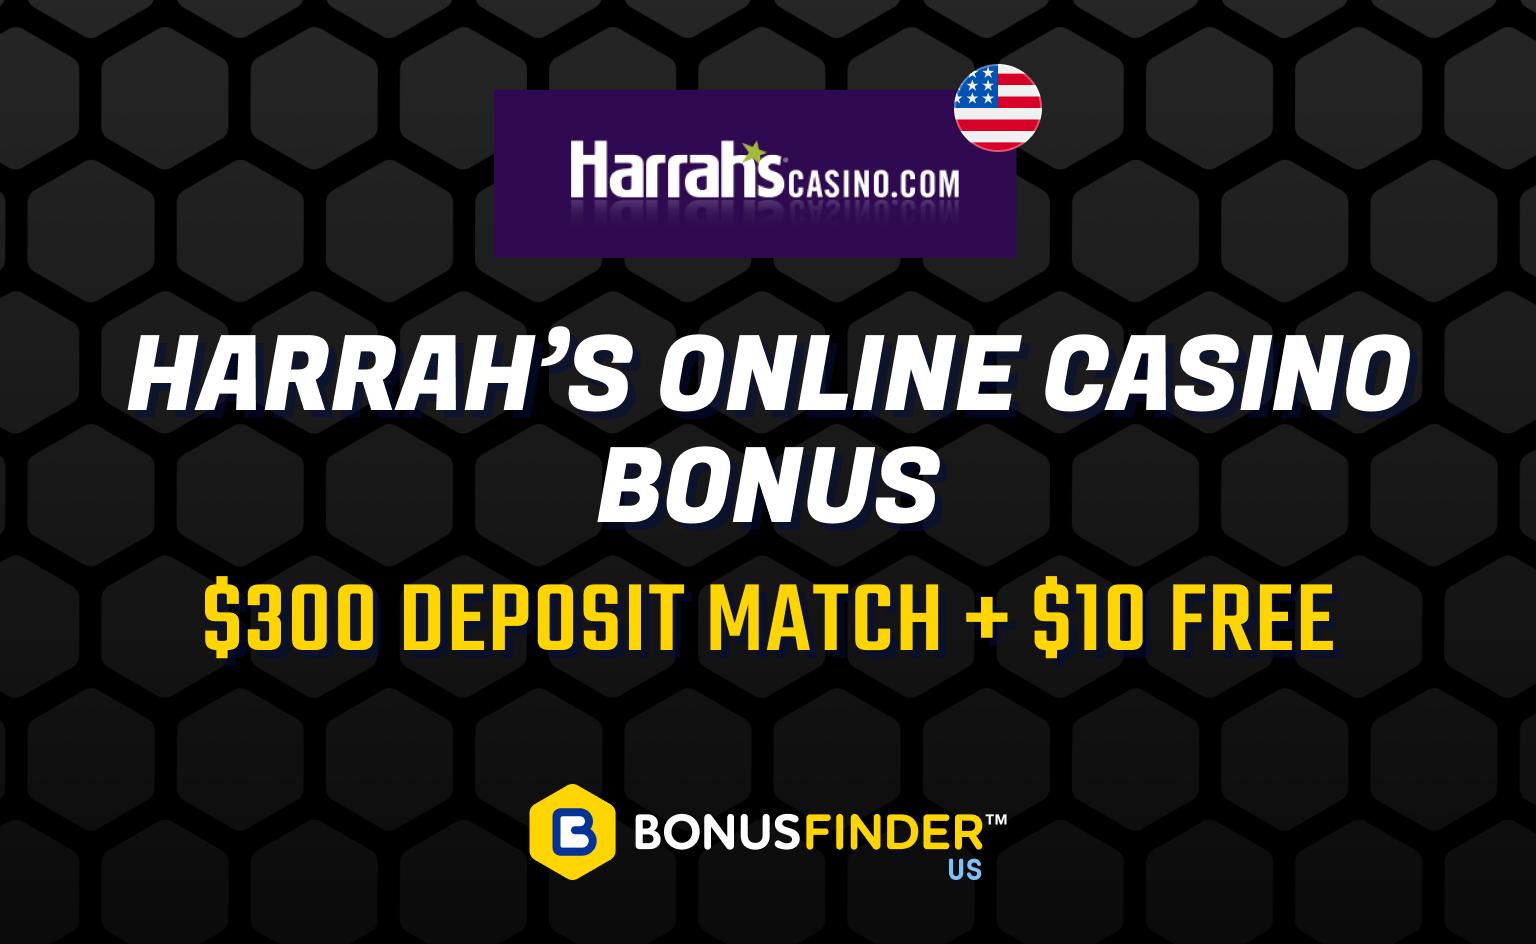 Harrahs online casino bonus